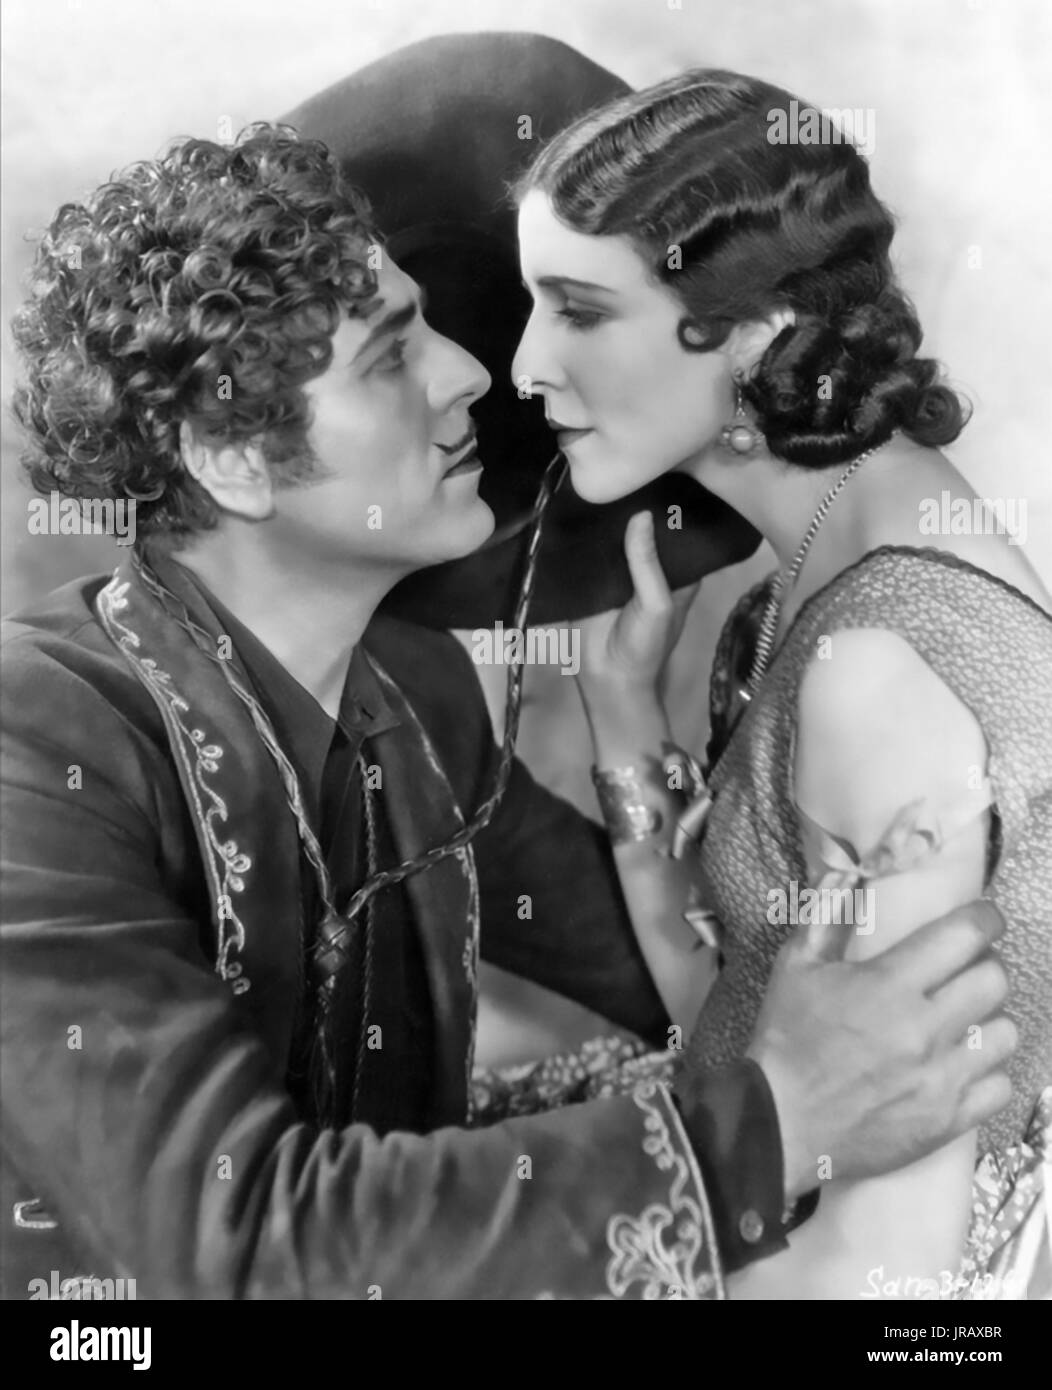 THE ARIZONA KID 1930 Fox Film Corporation production with Mona Maris and Warner Baxter - Stock Image